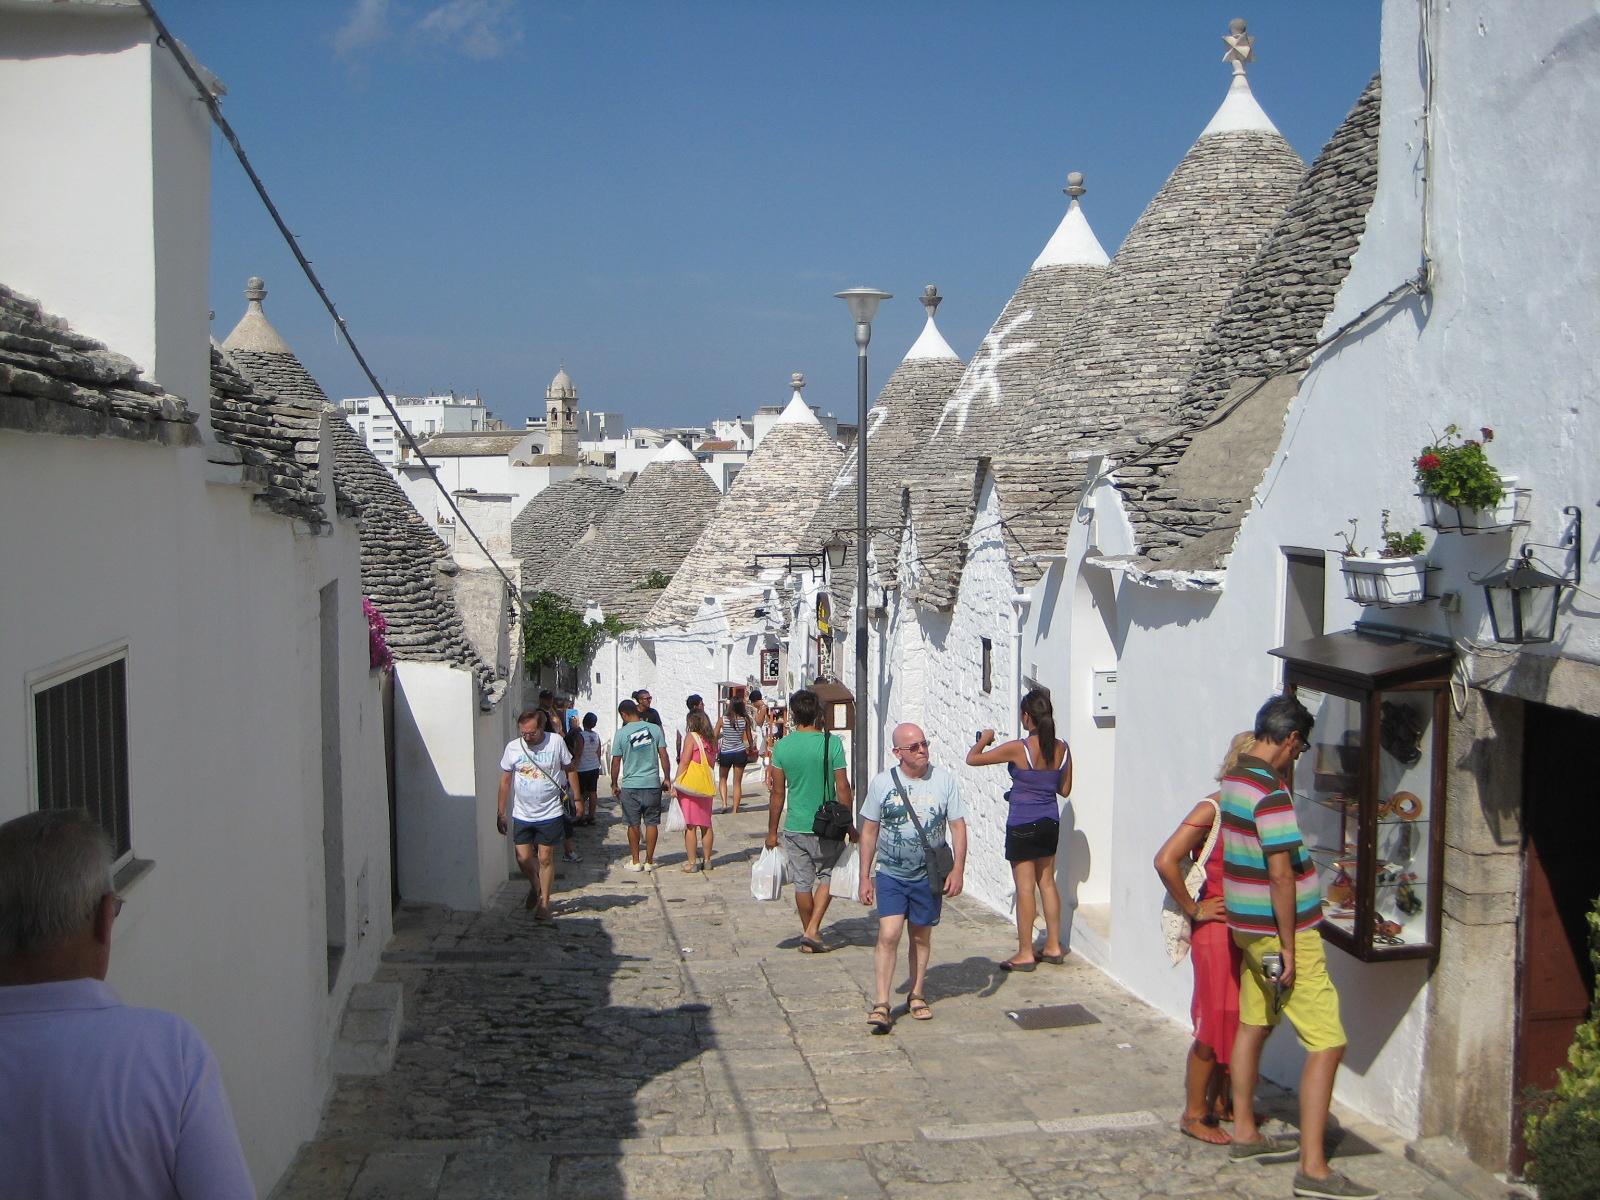 Die drolligen Trulli-Bauten in Alberobello